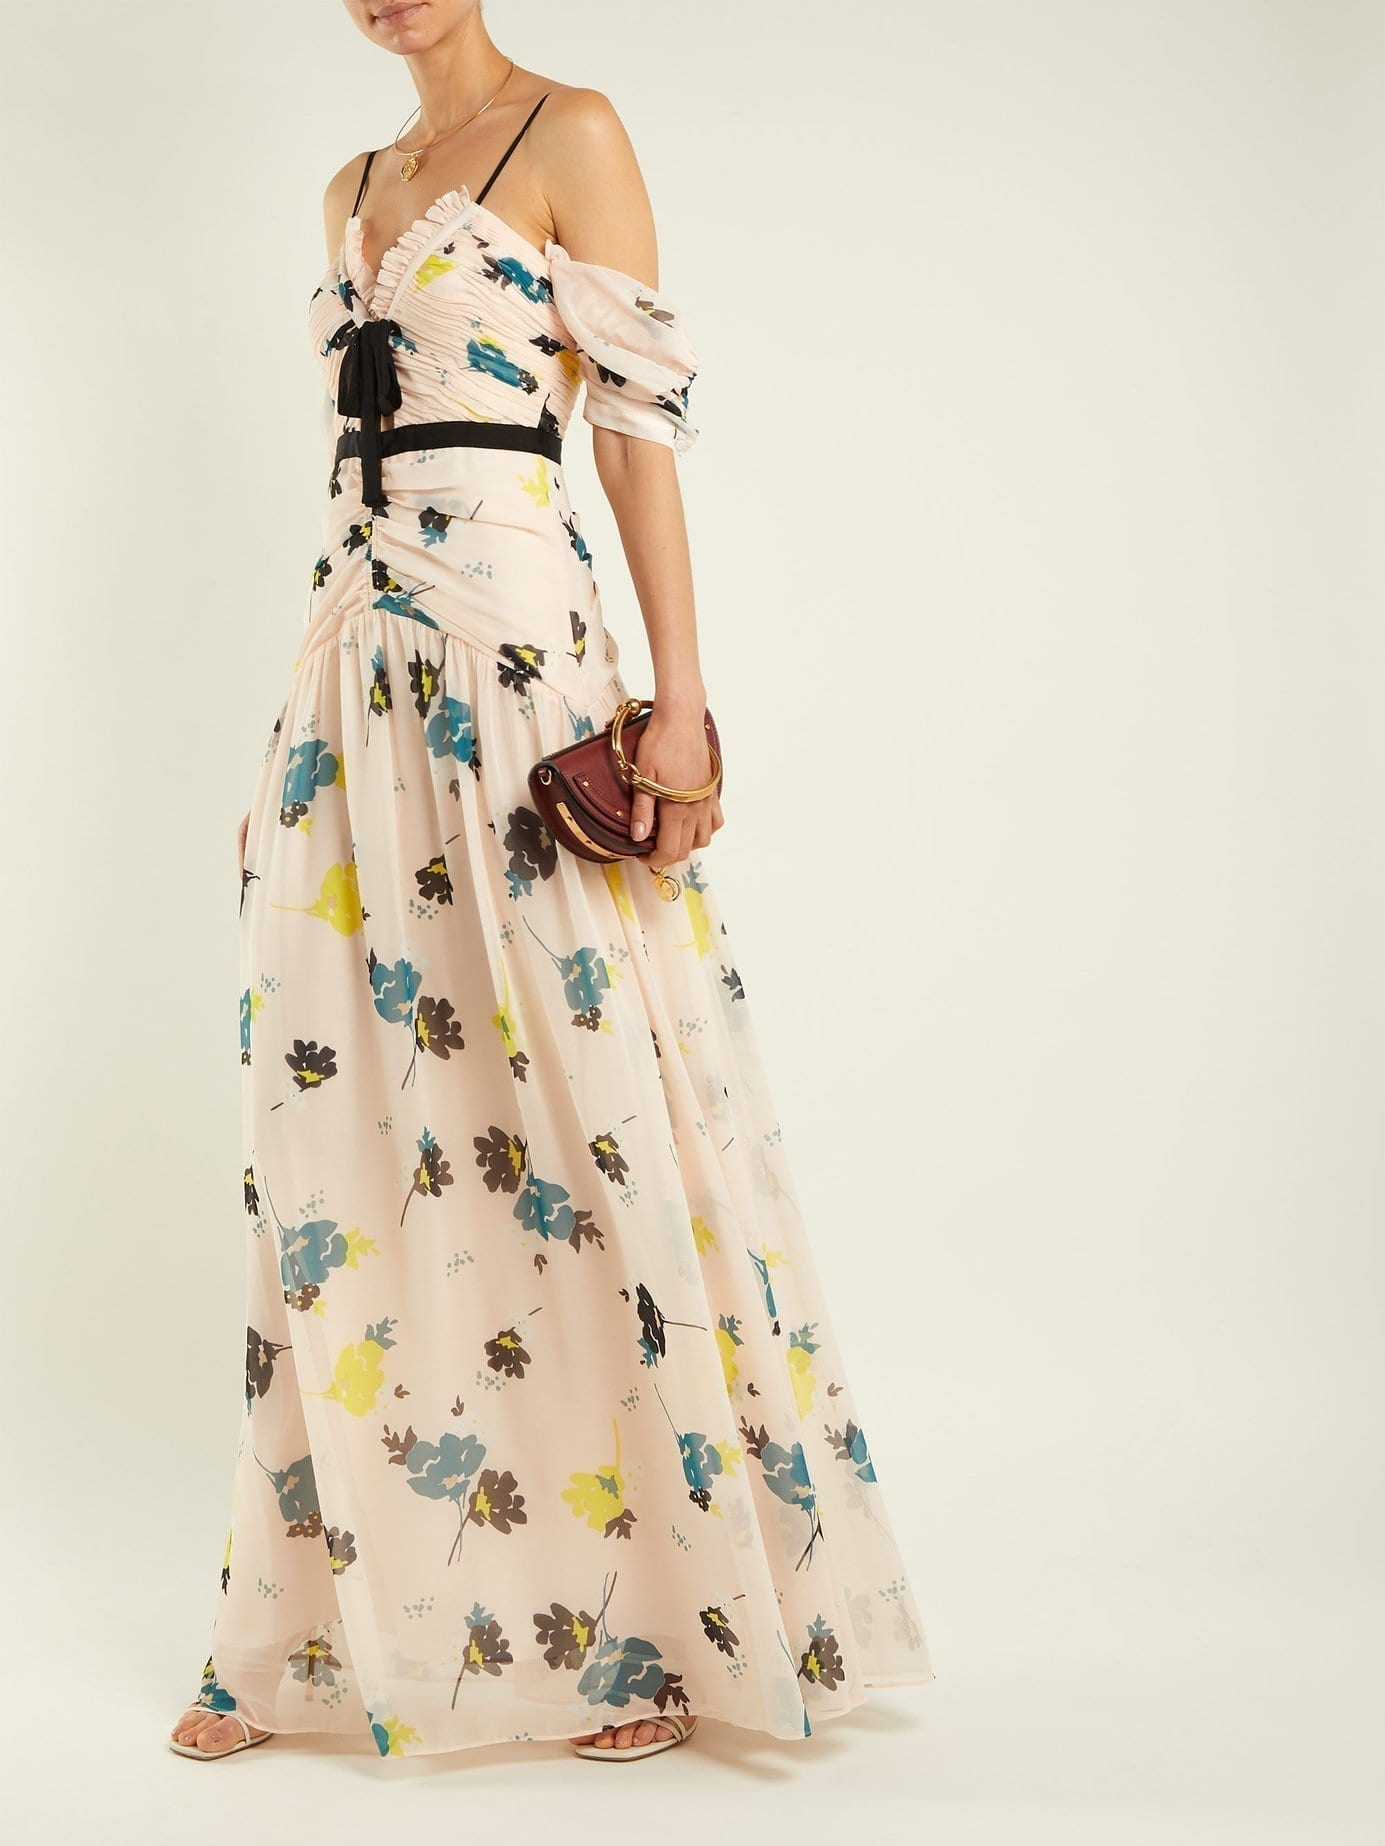 SELF-PORTRAIT Chiffon Maxi Light Pink / Floral Printed Dress